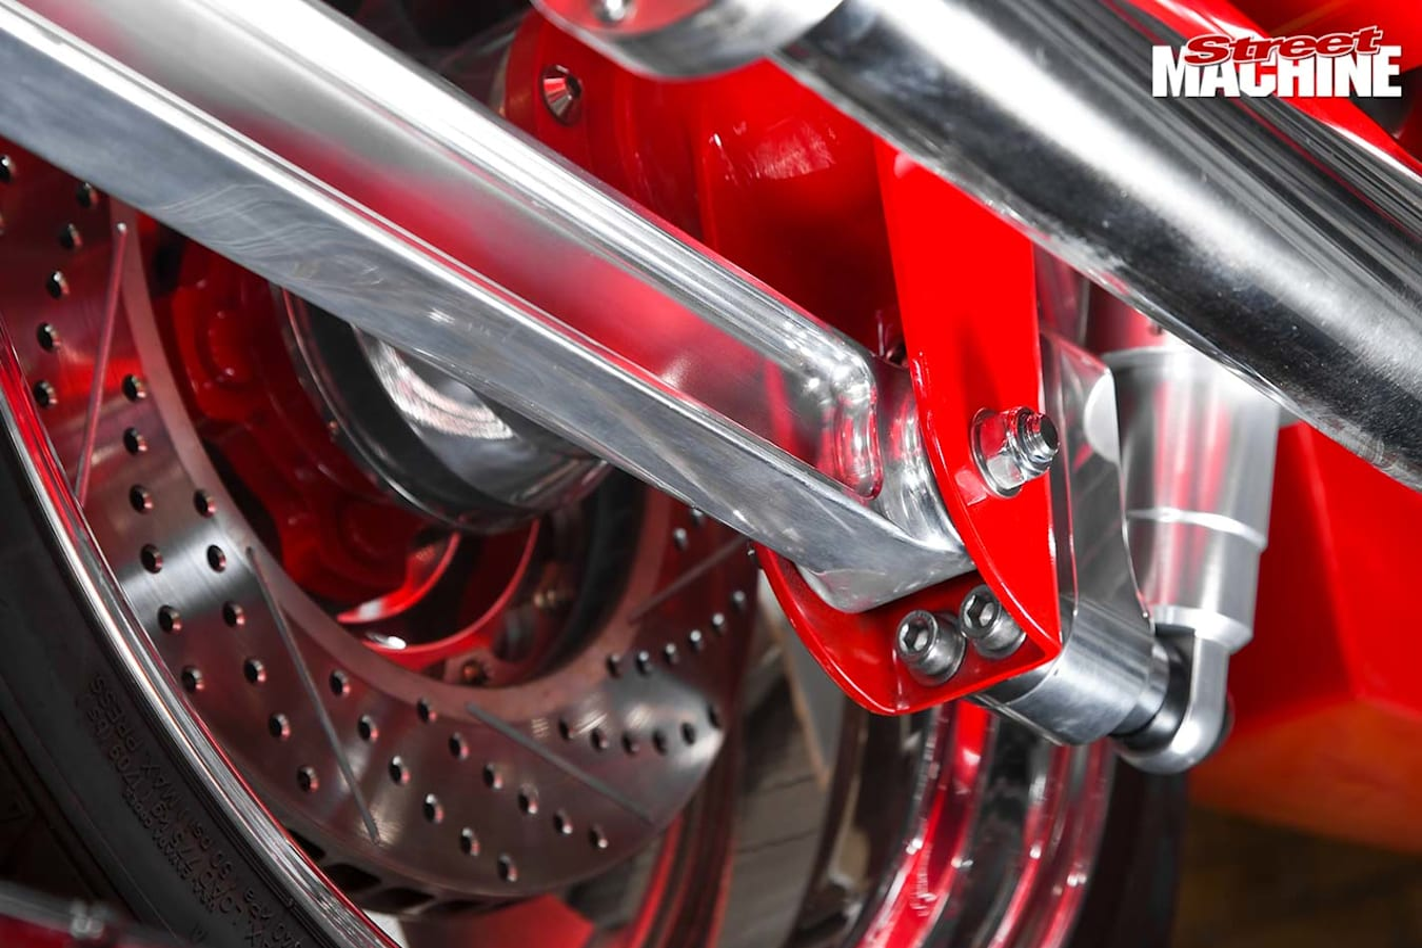 Chev Camaro brakes